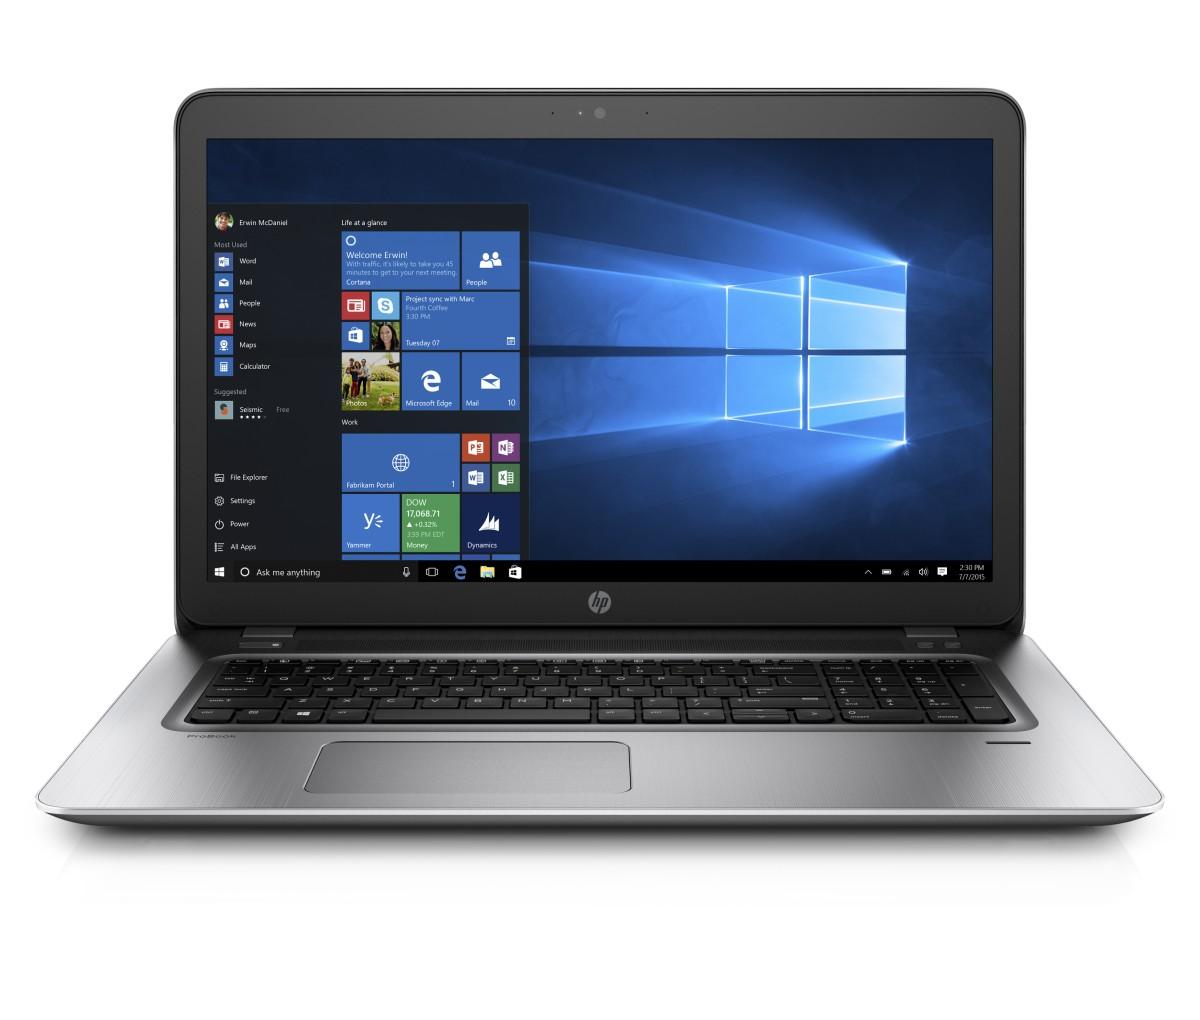 HP ProBook 470 G4 i5-7200U/8GB/128GB SSD + 1TB/GF930MX/2G/17,3'' FHD/Win 10 - sea model